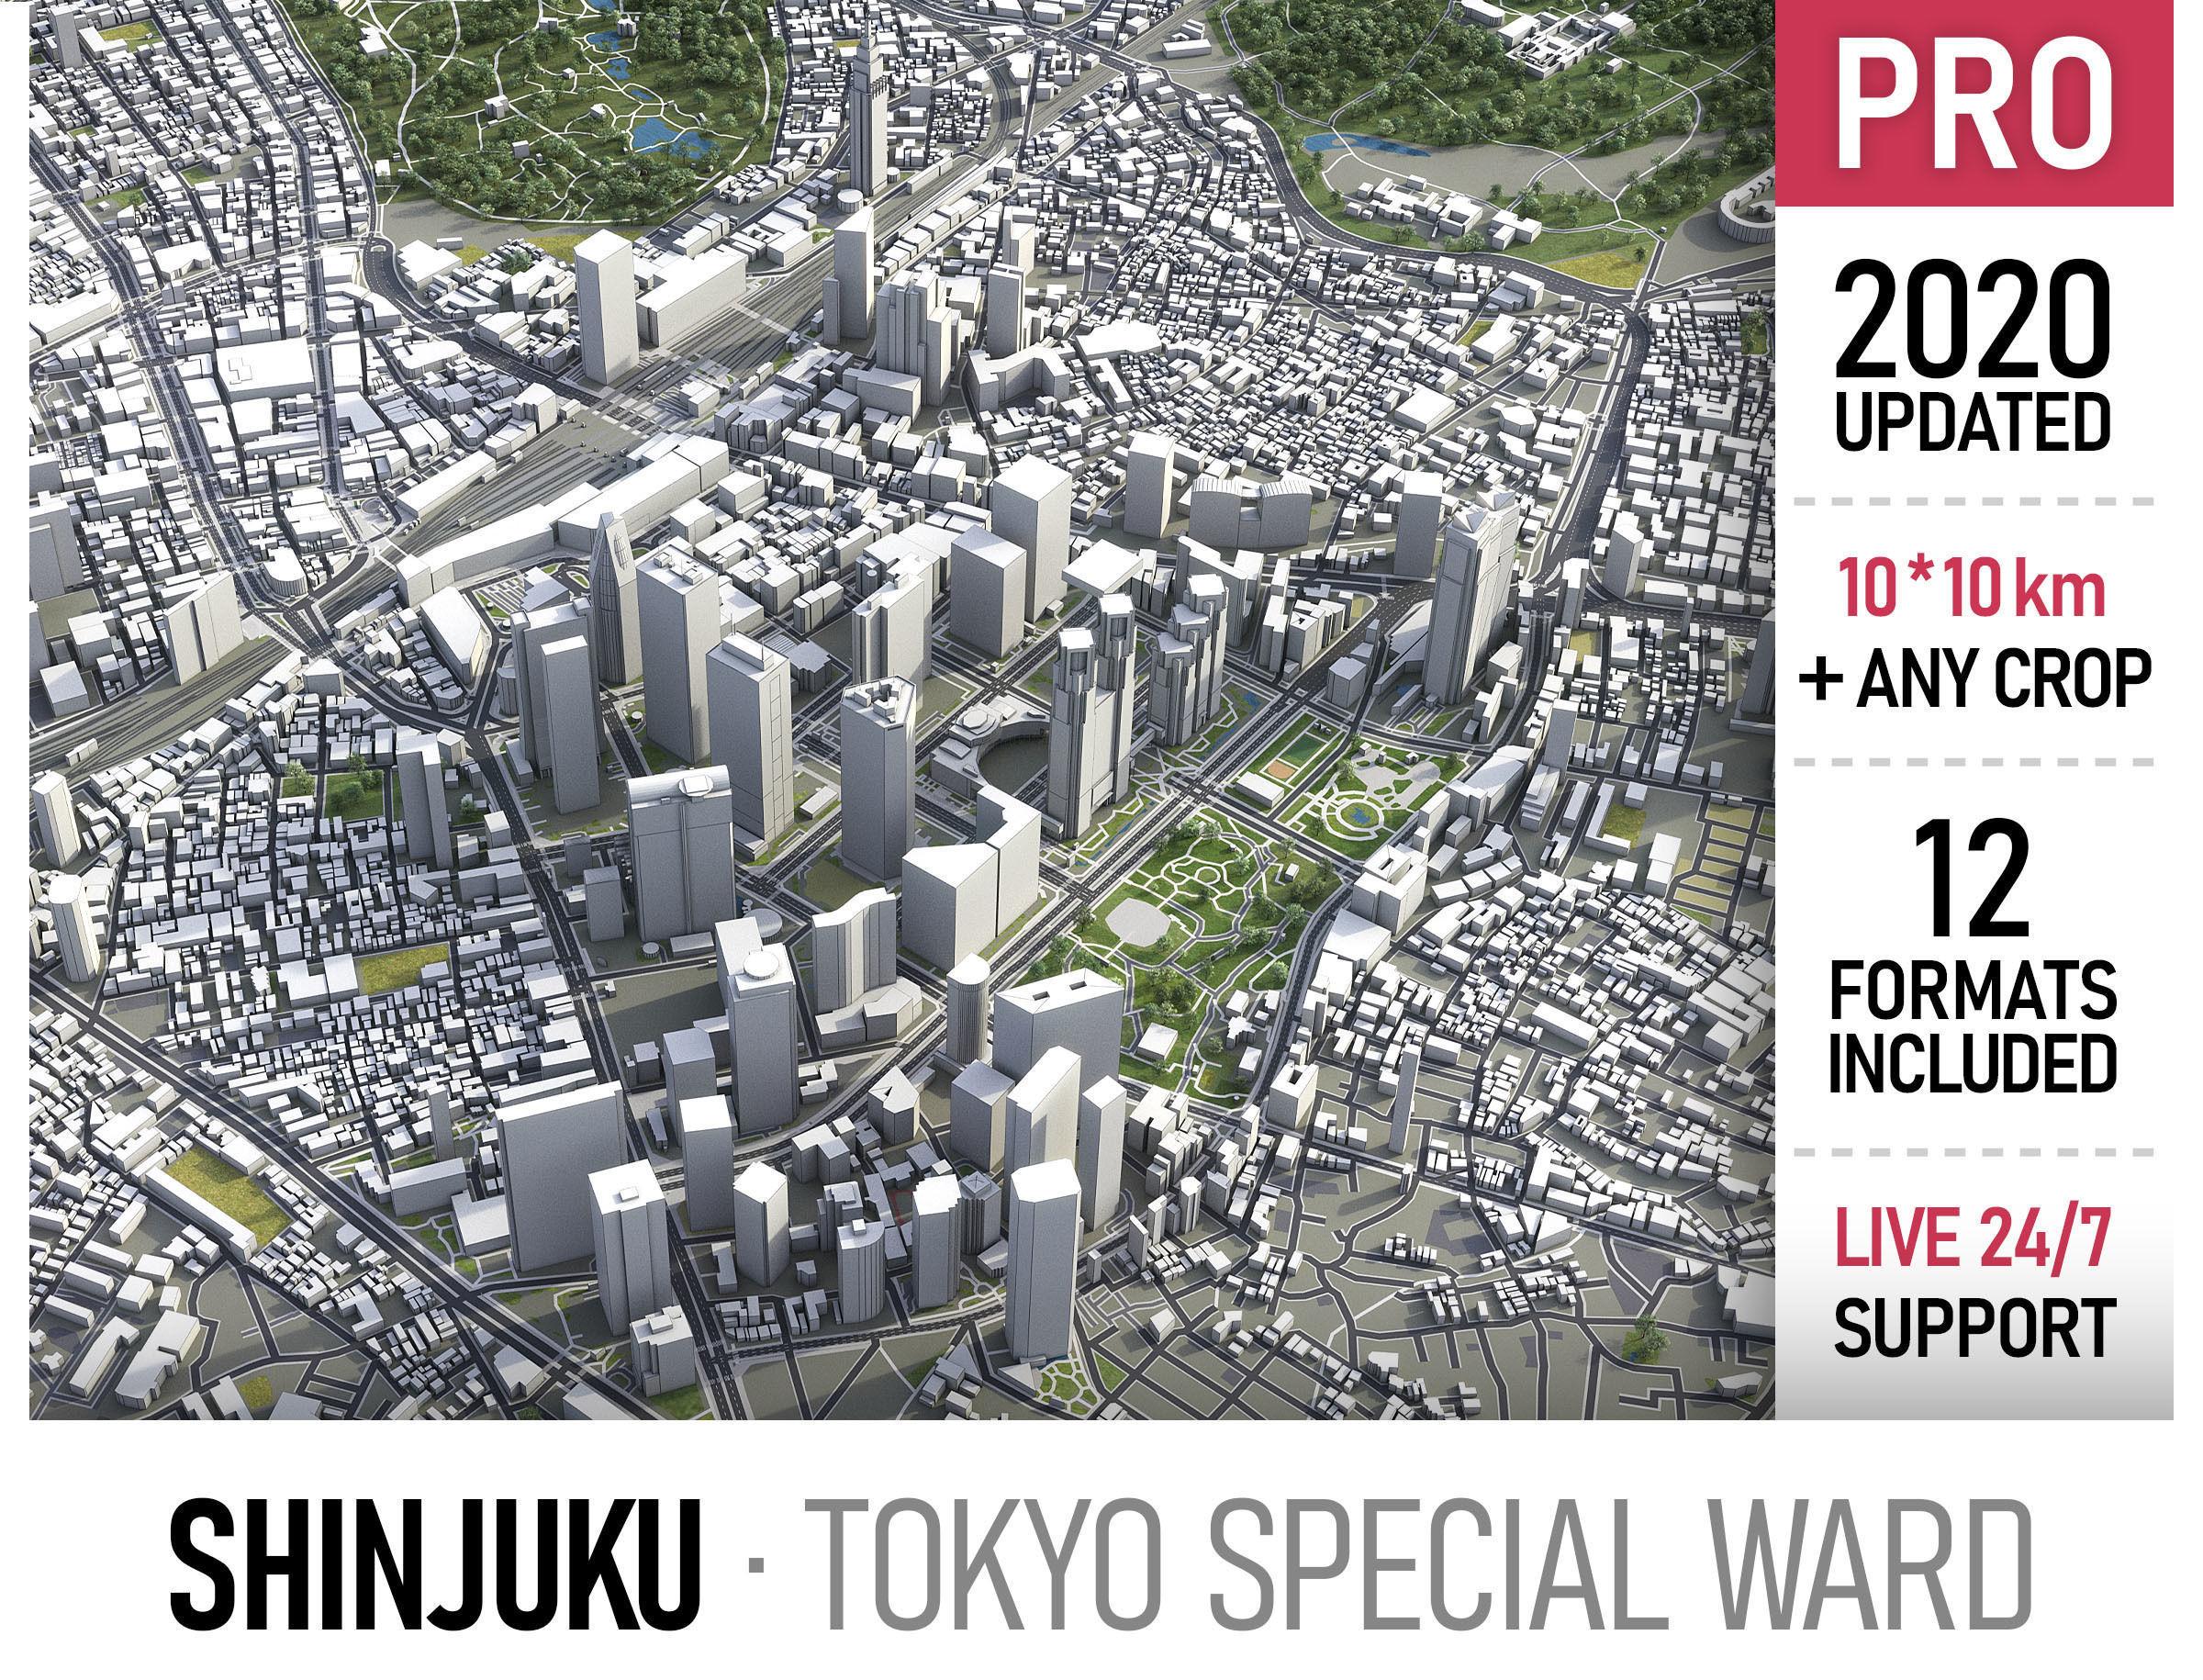 Shinjuku - Tokyo special ward